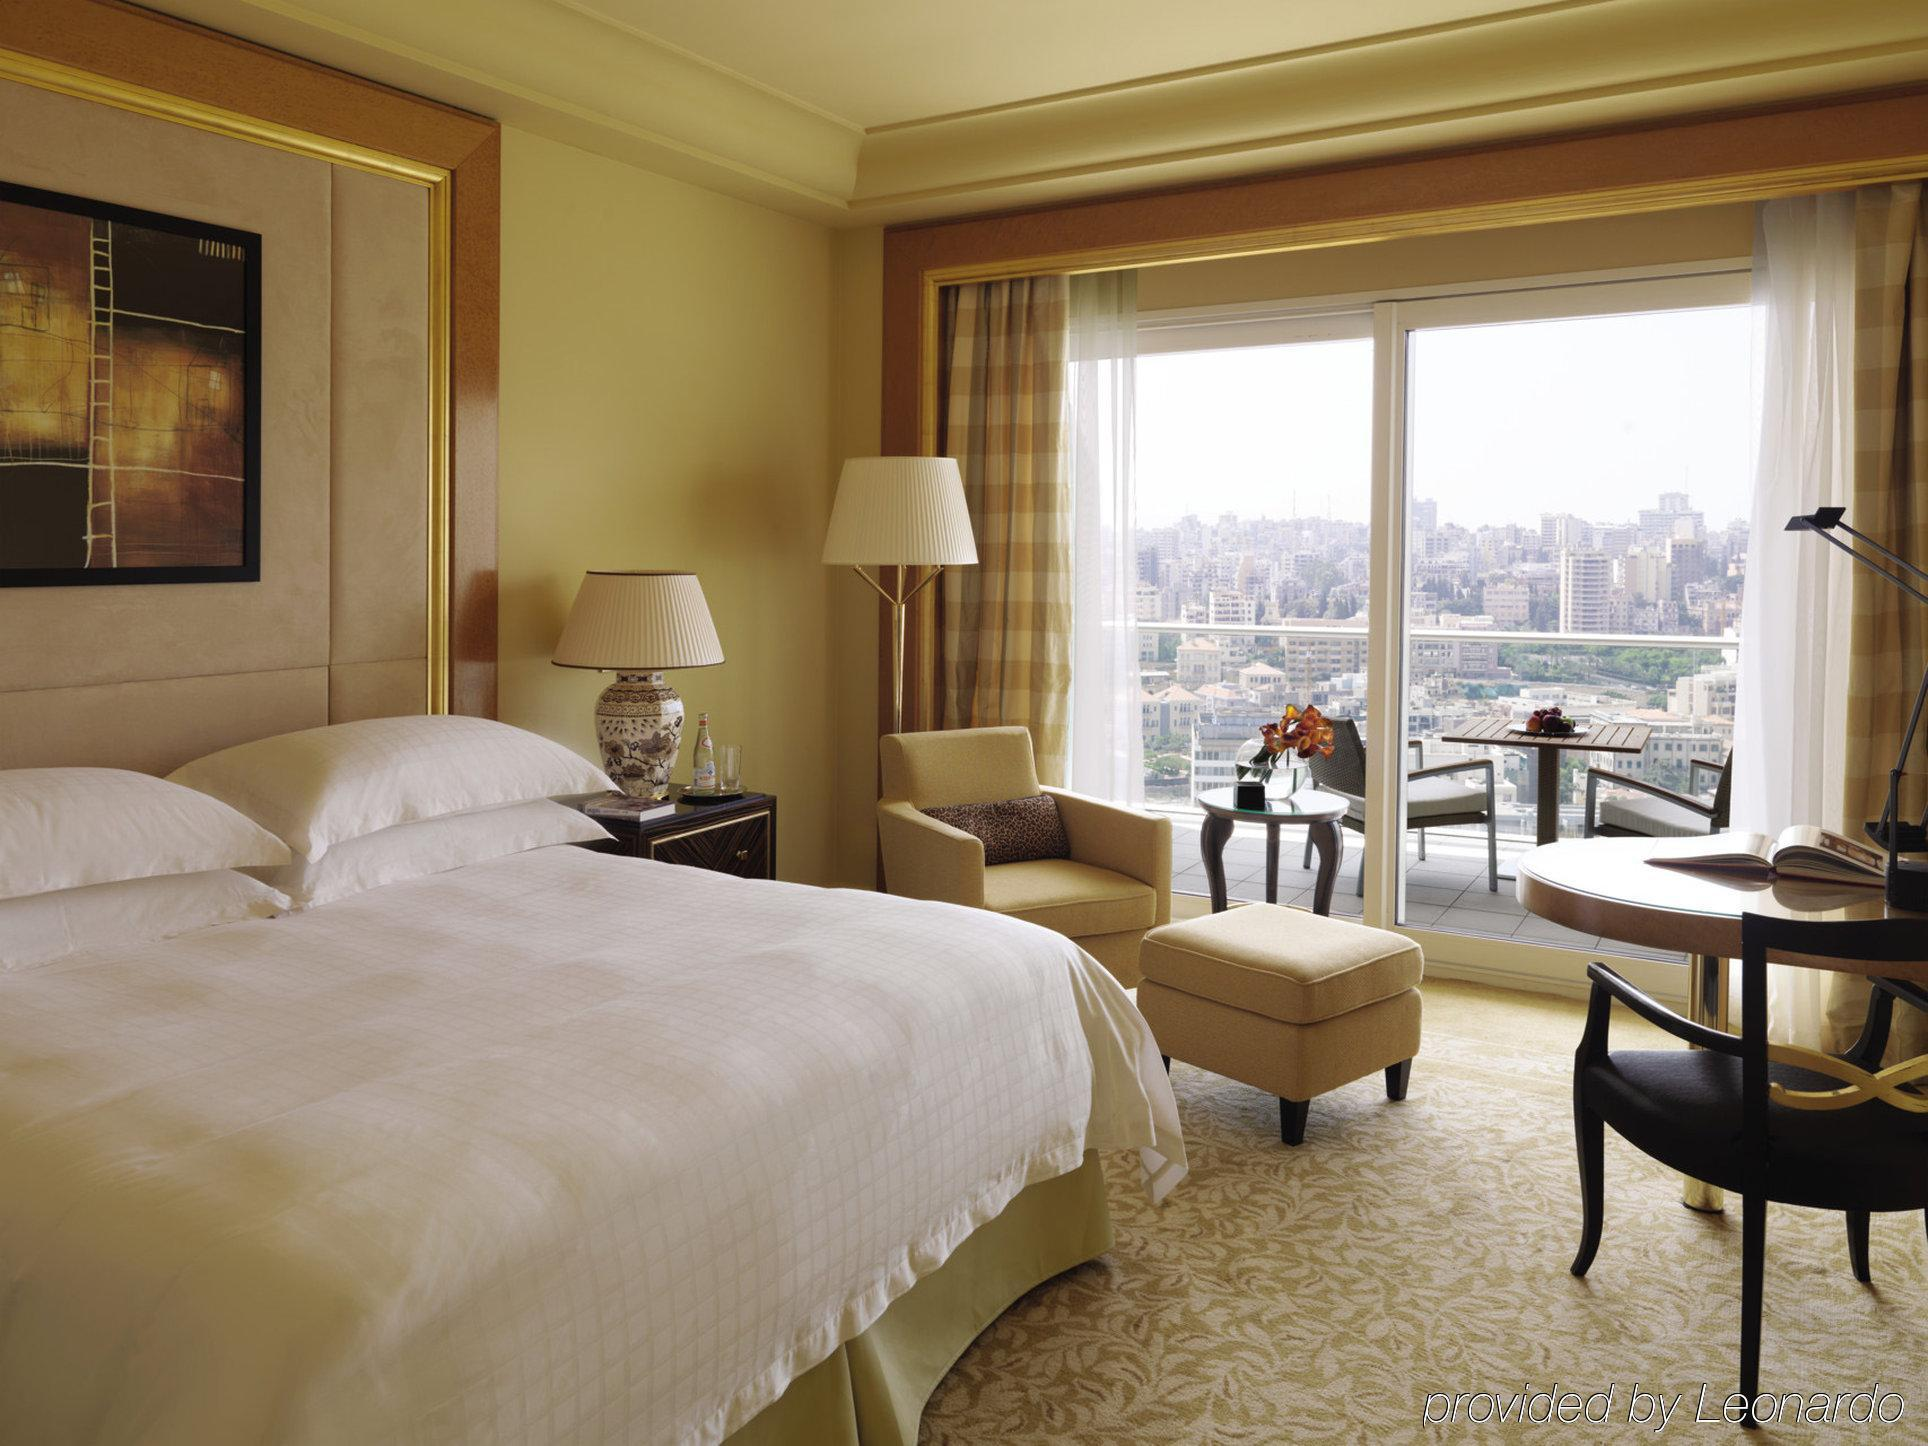 HOTEL FOUR SEASONS BEIRUT BEIRUT